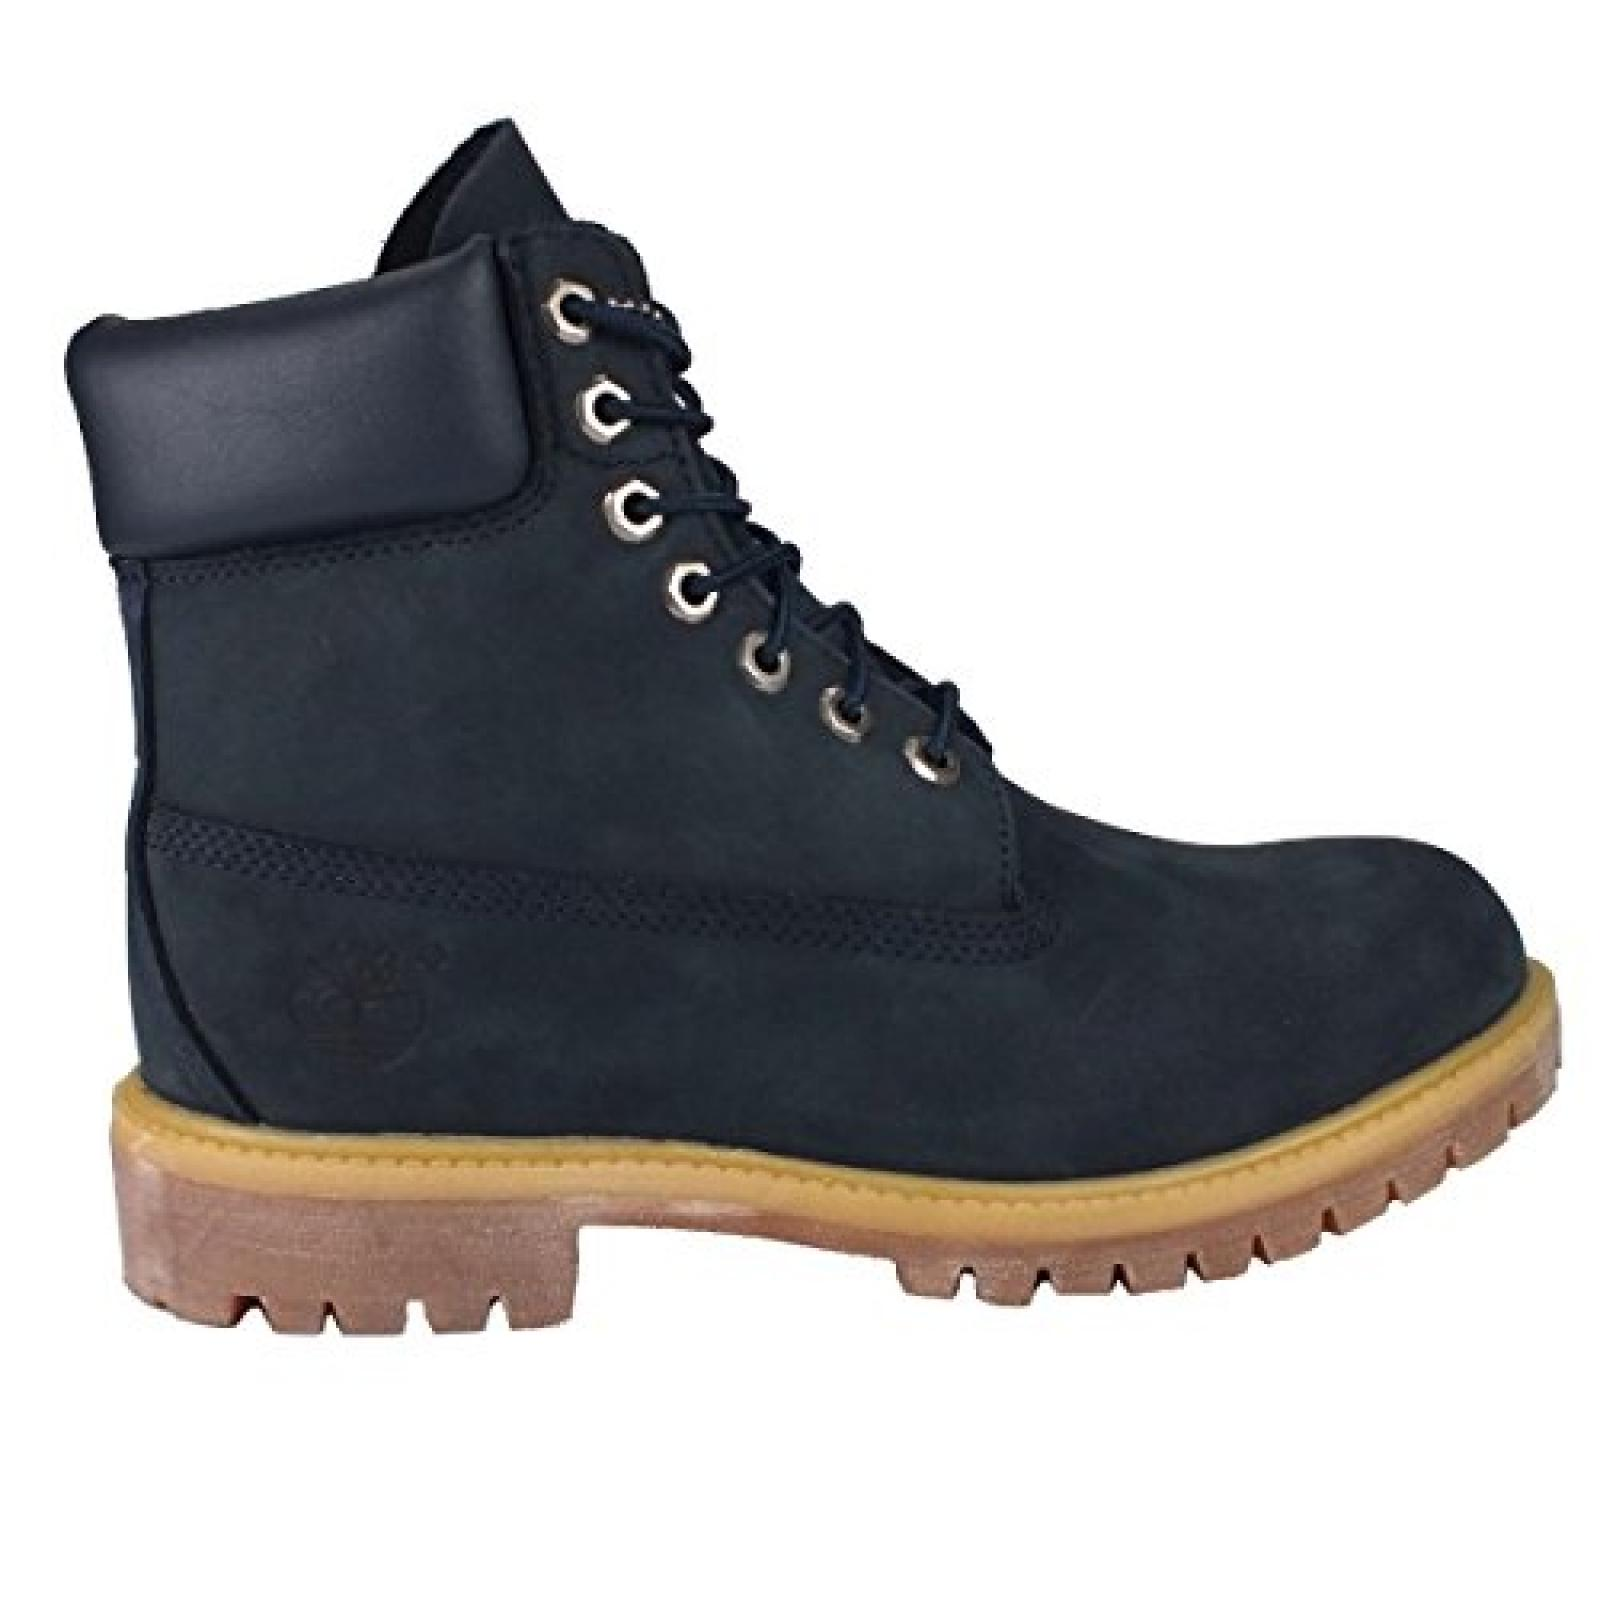 "Timberland 6"" Premium Boot Navy 6163A"